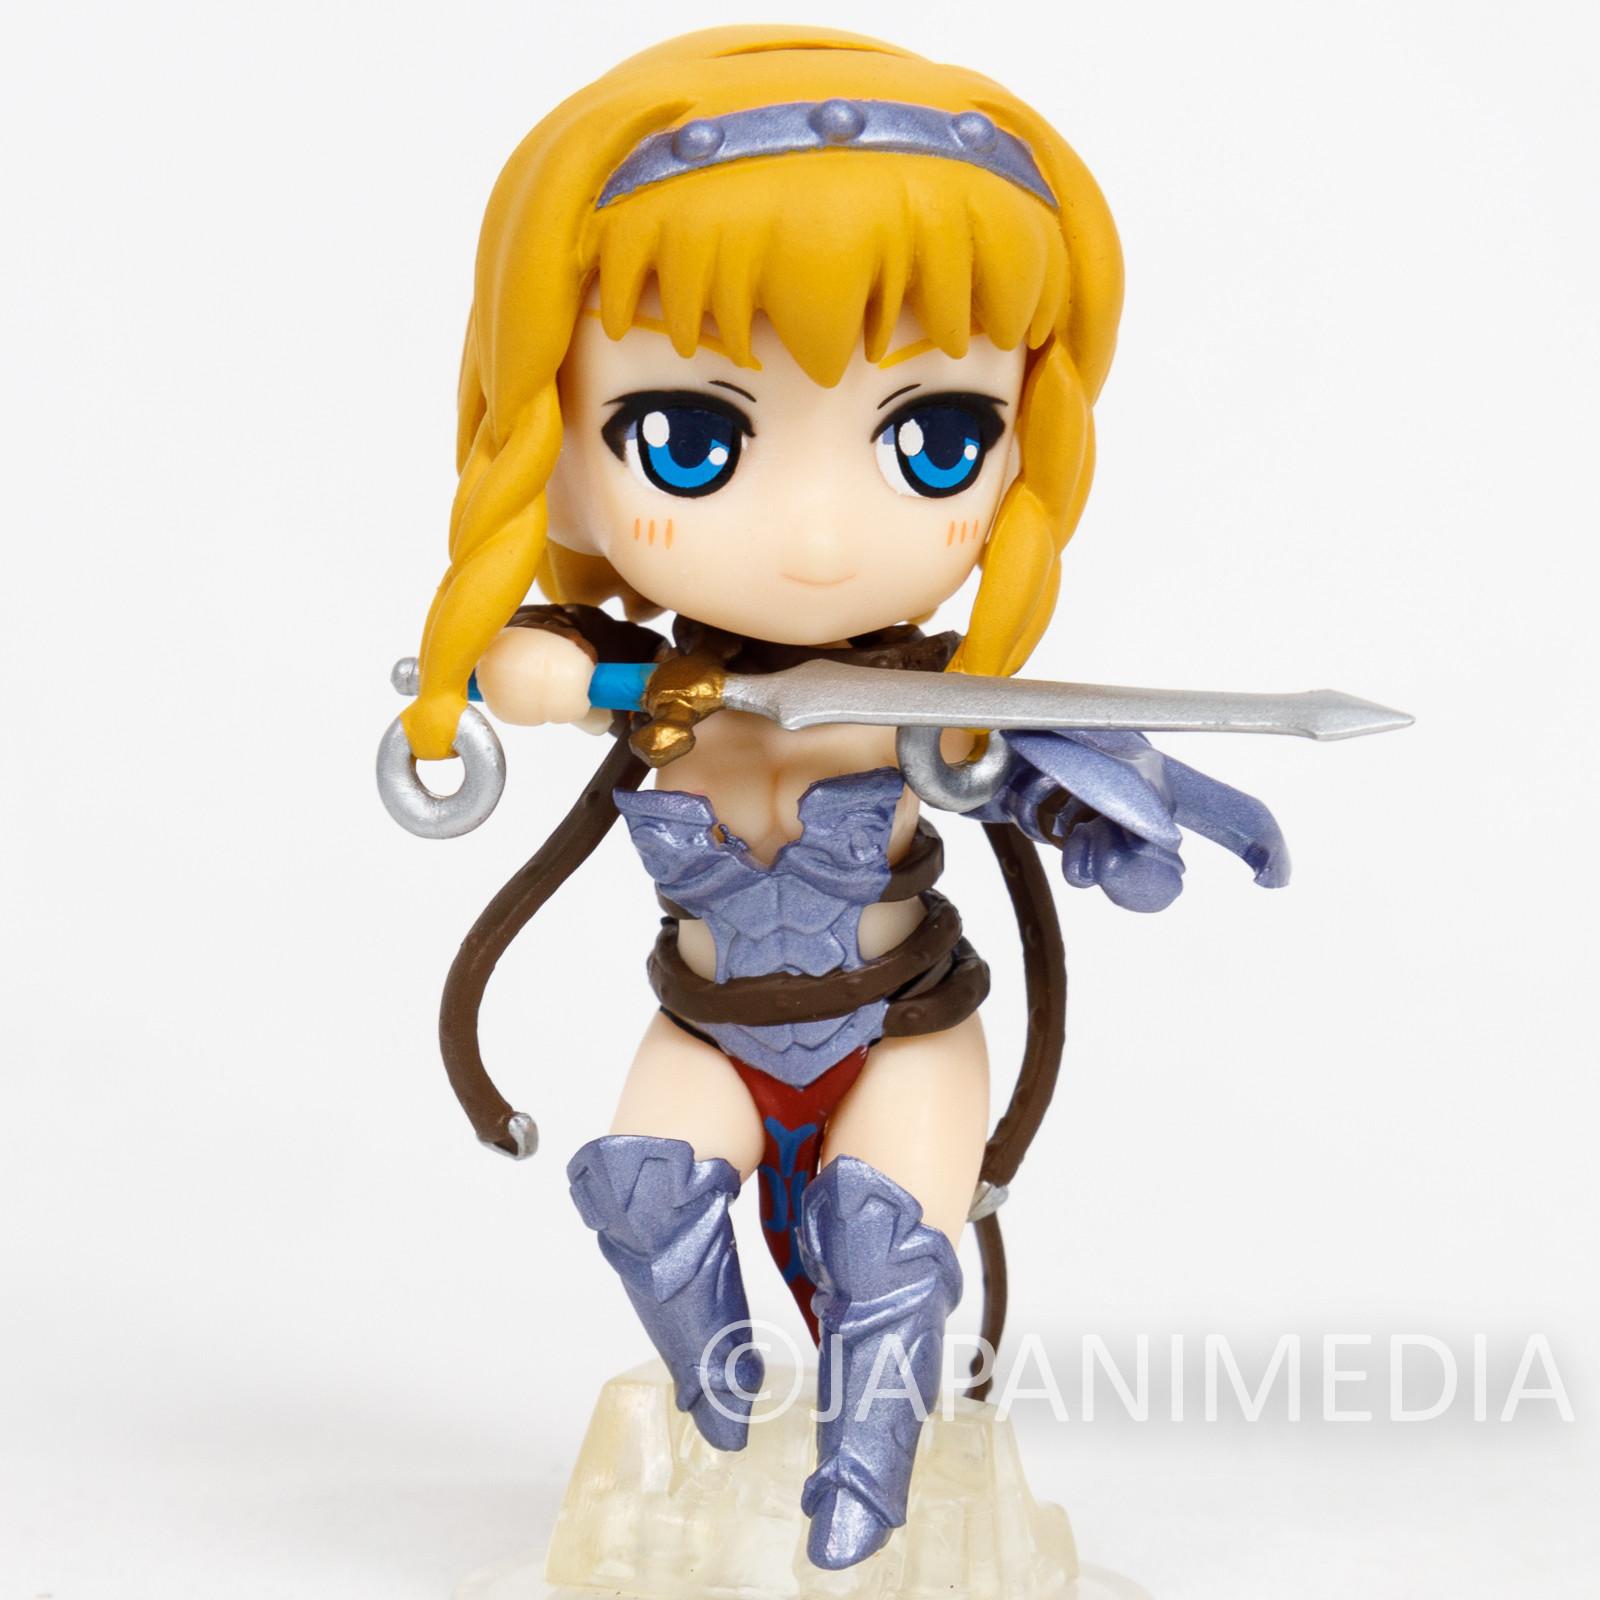 Queen's Blade Leina Vance Mini Figure Collection Hobby Japan